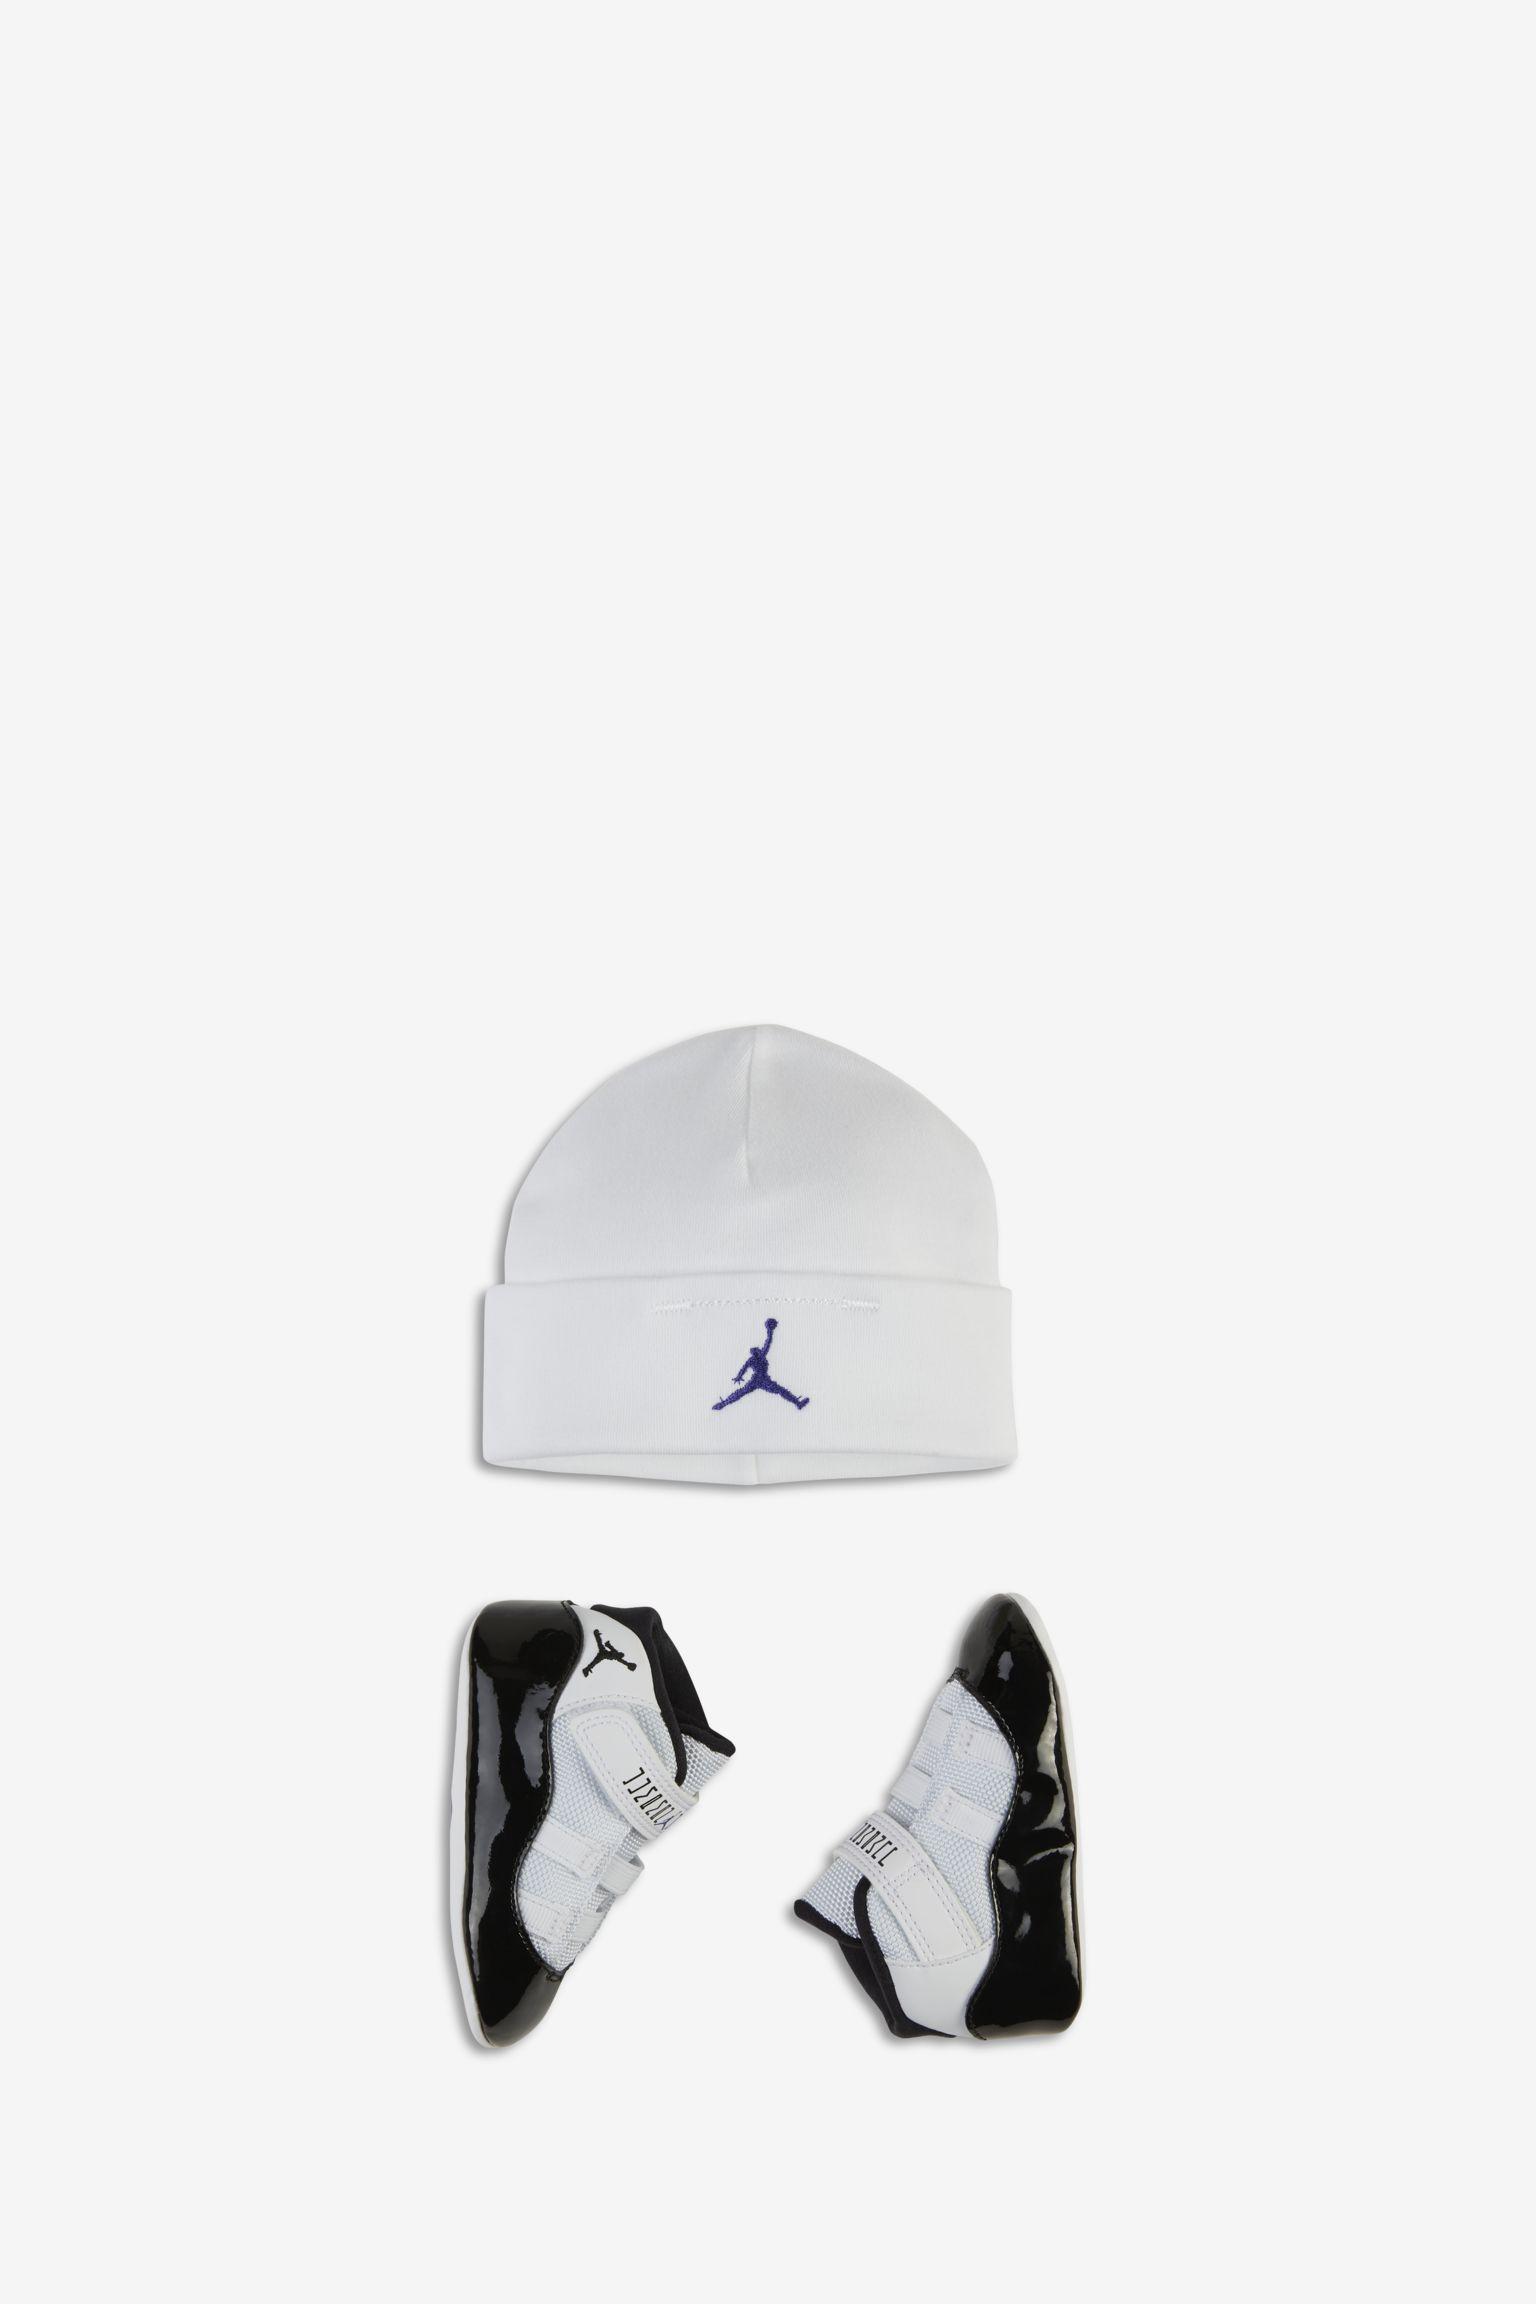 Air Jordan 11 Concord BG 'White & Black' 发布日期